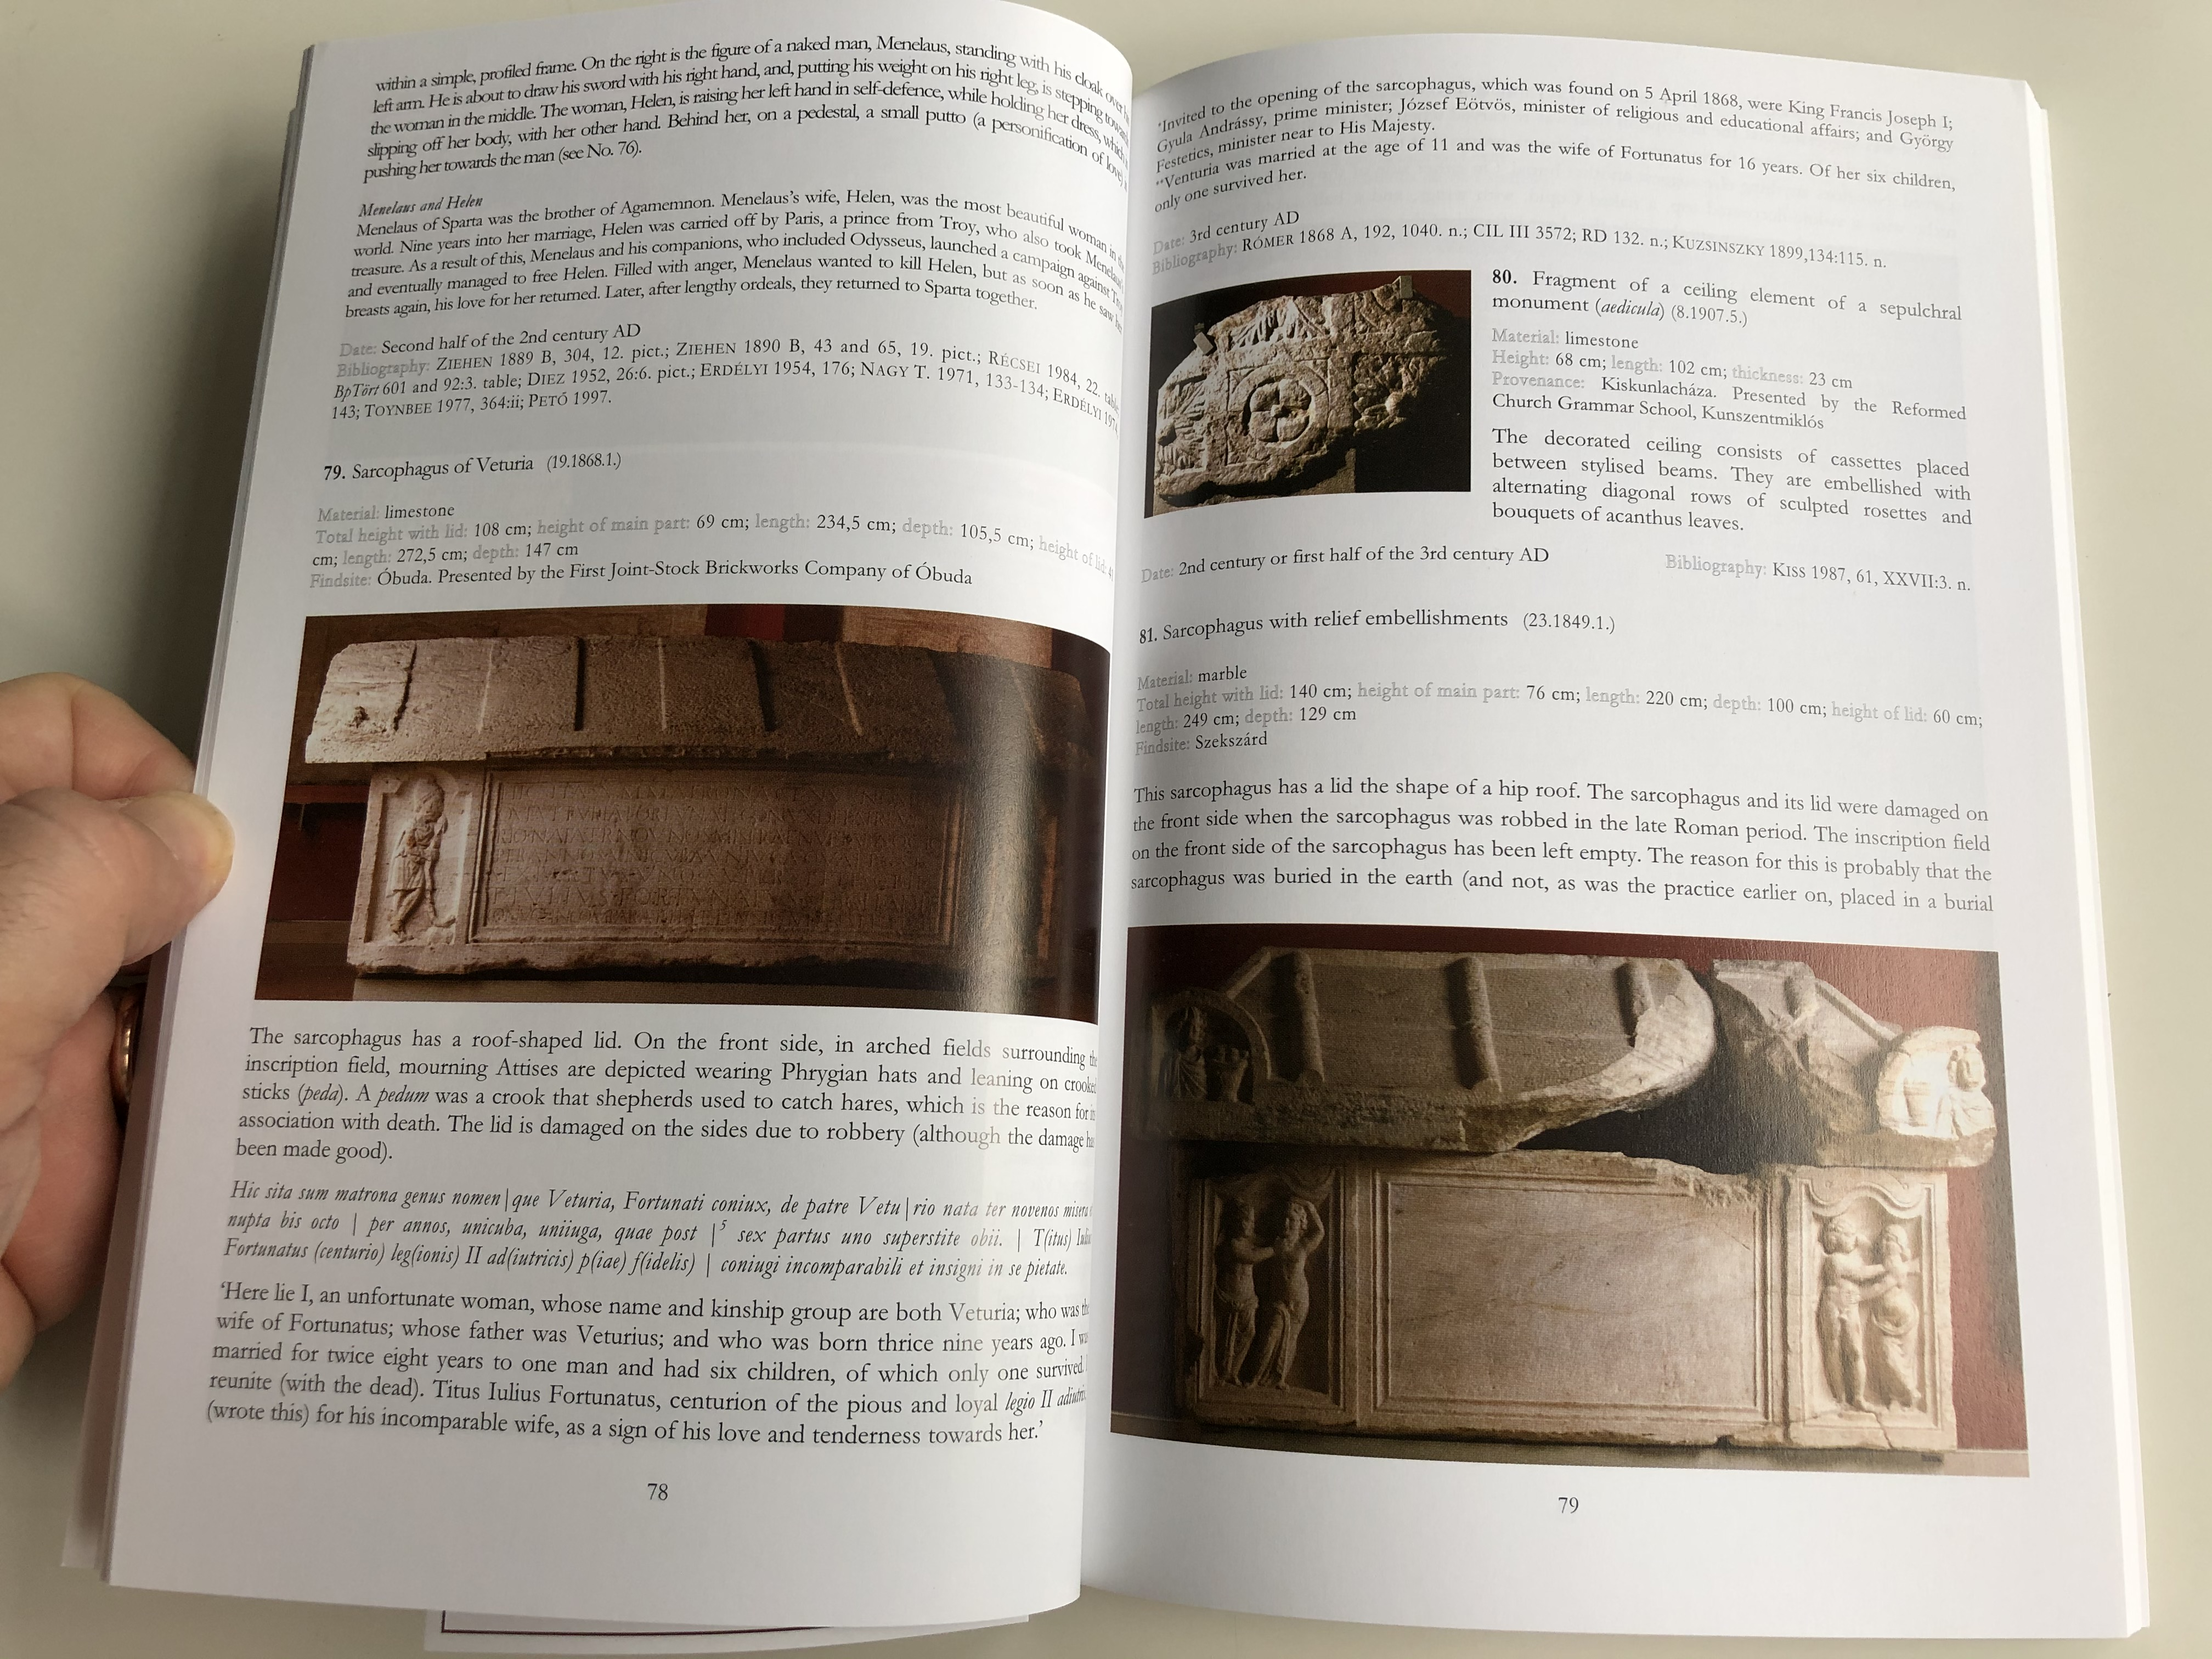 roman-stones-by-mih-ly-nagy-lapidarium-10.jpg